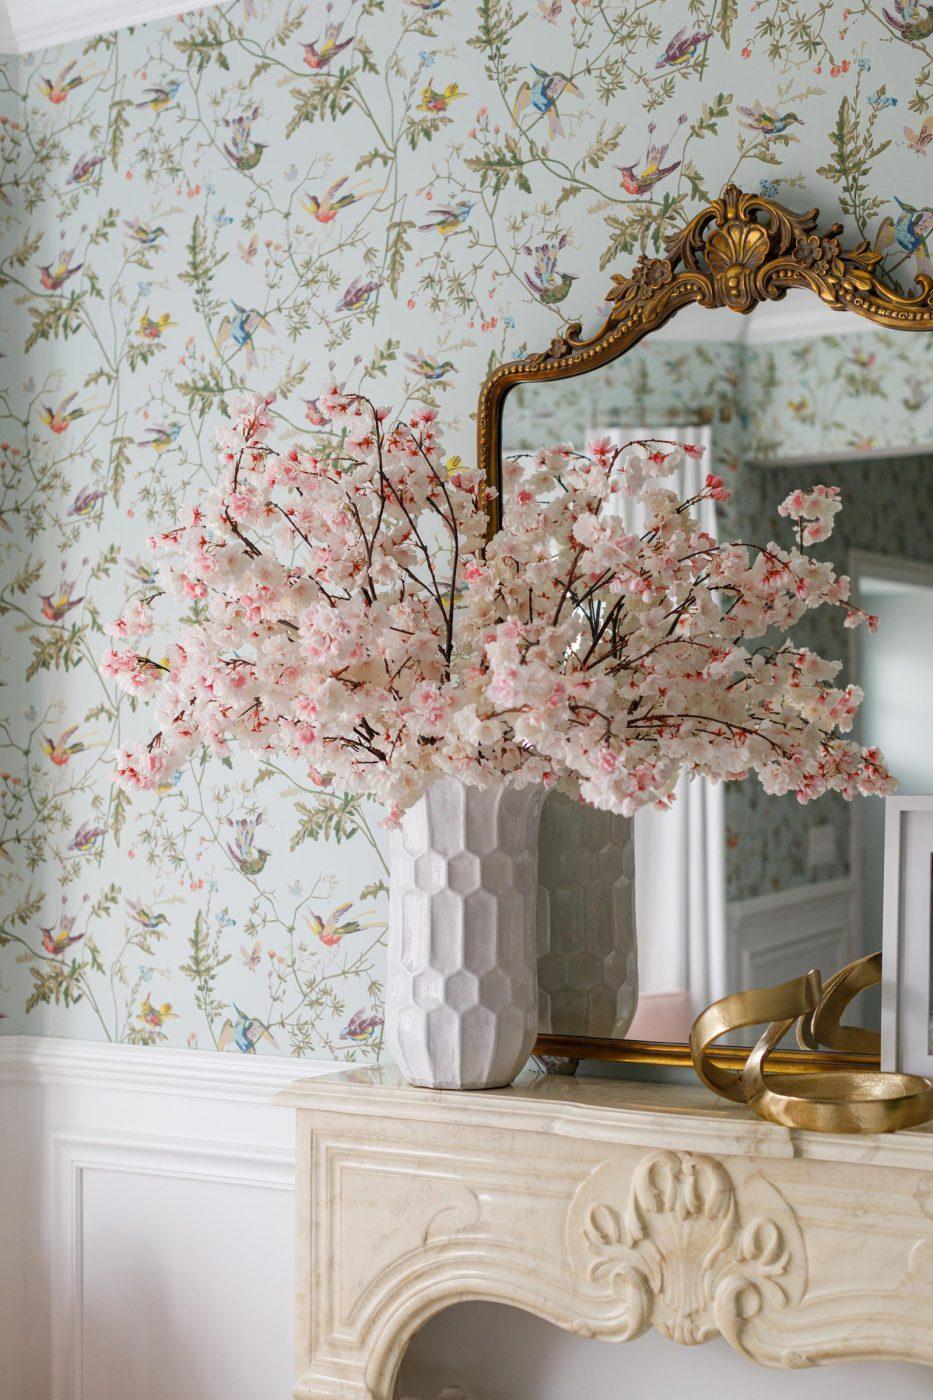 Ballard Designs Vase Cherry Blossoms